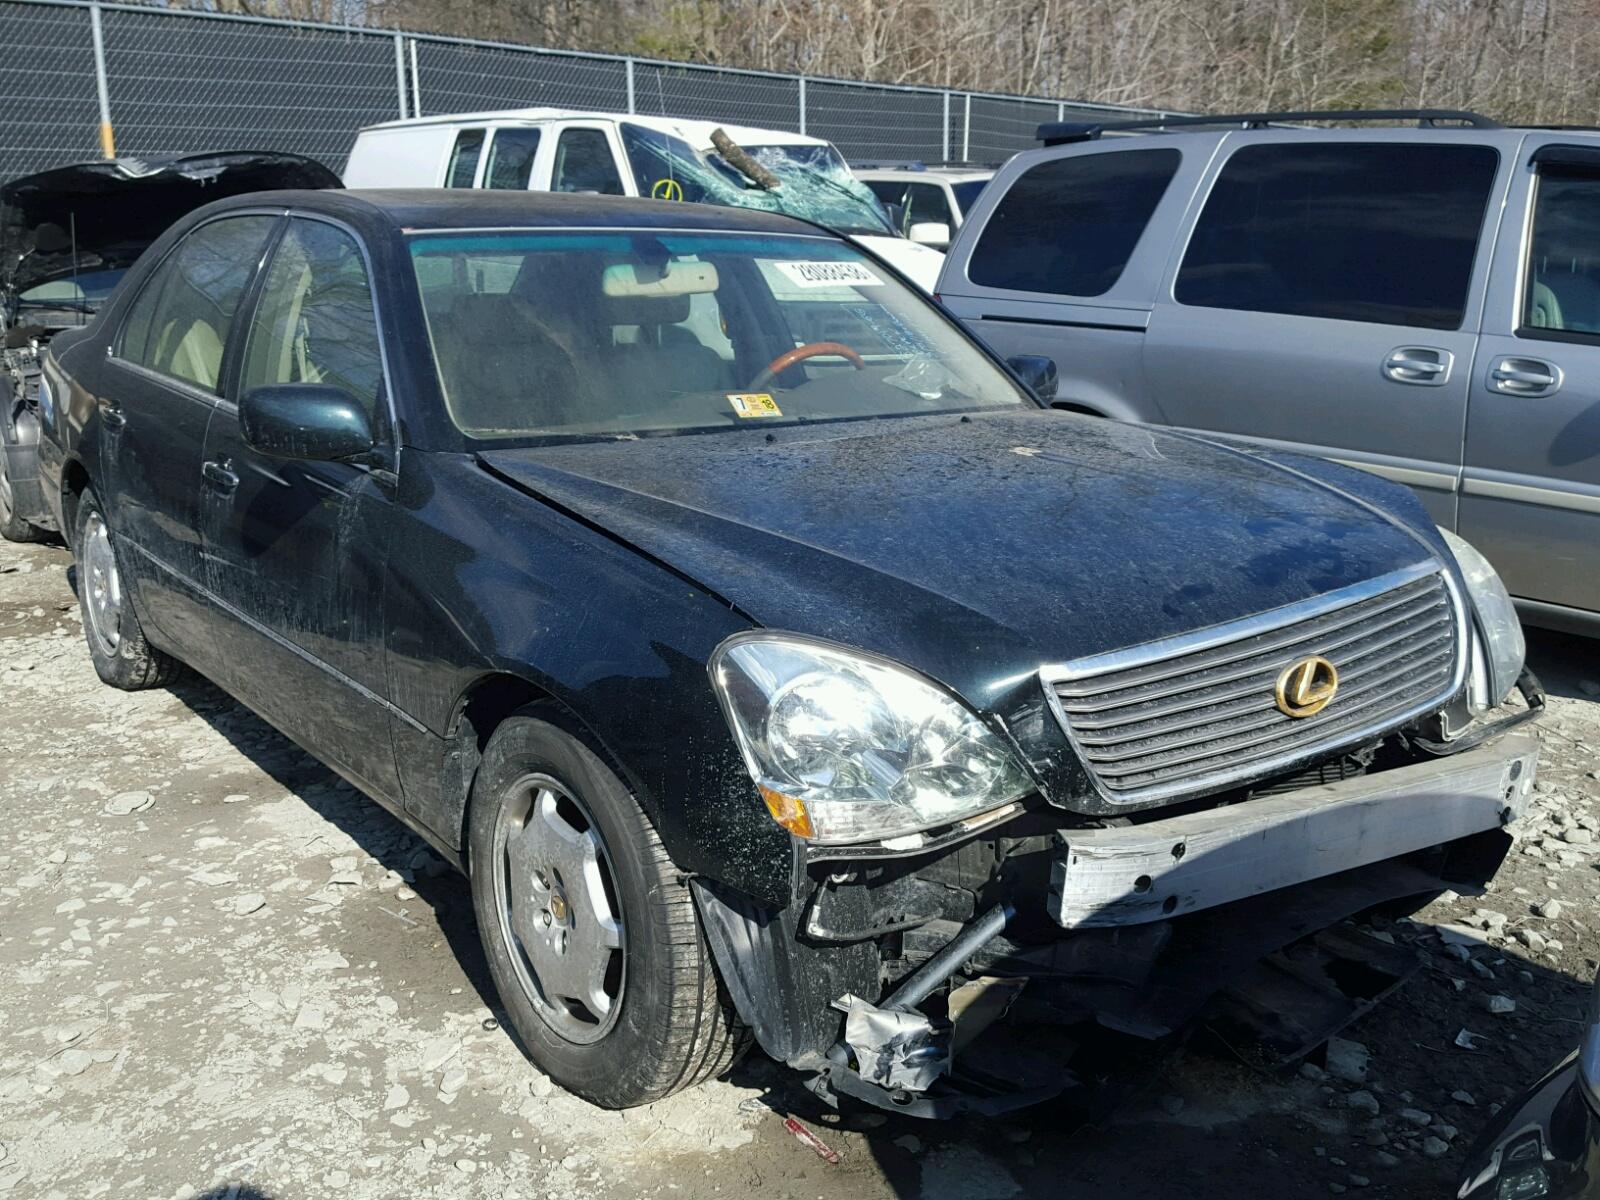 kildeer winthrop sale park black used harbor lexus highland car sedan htm for